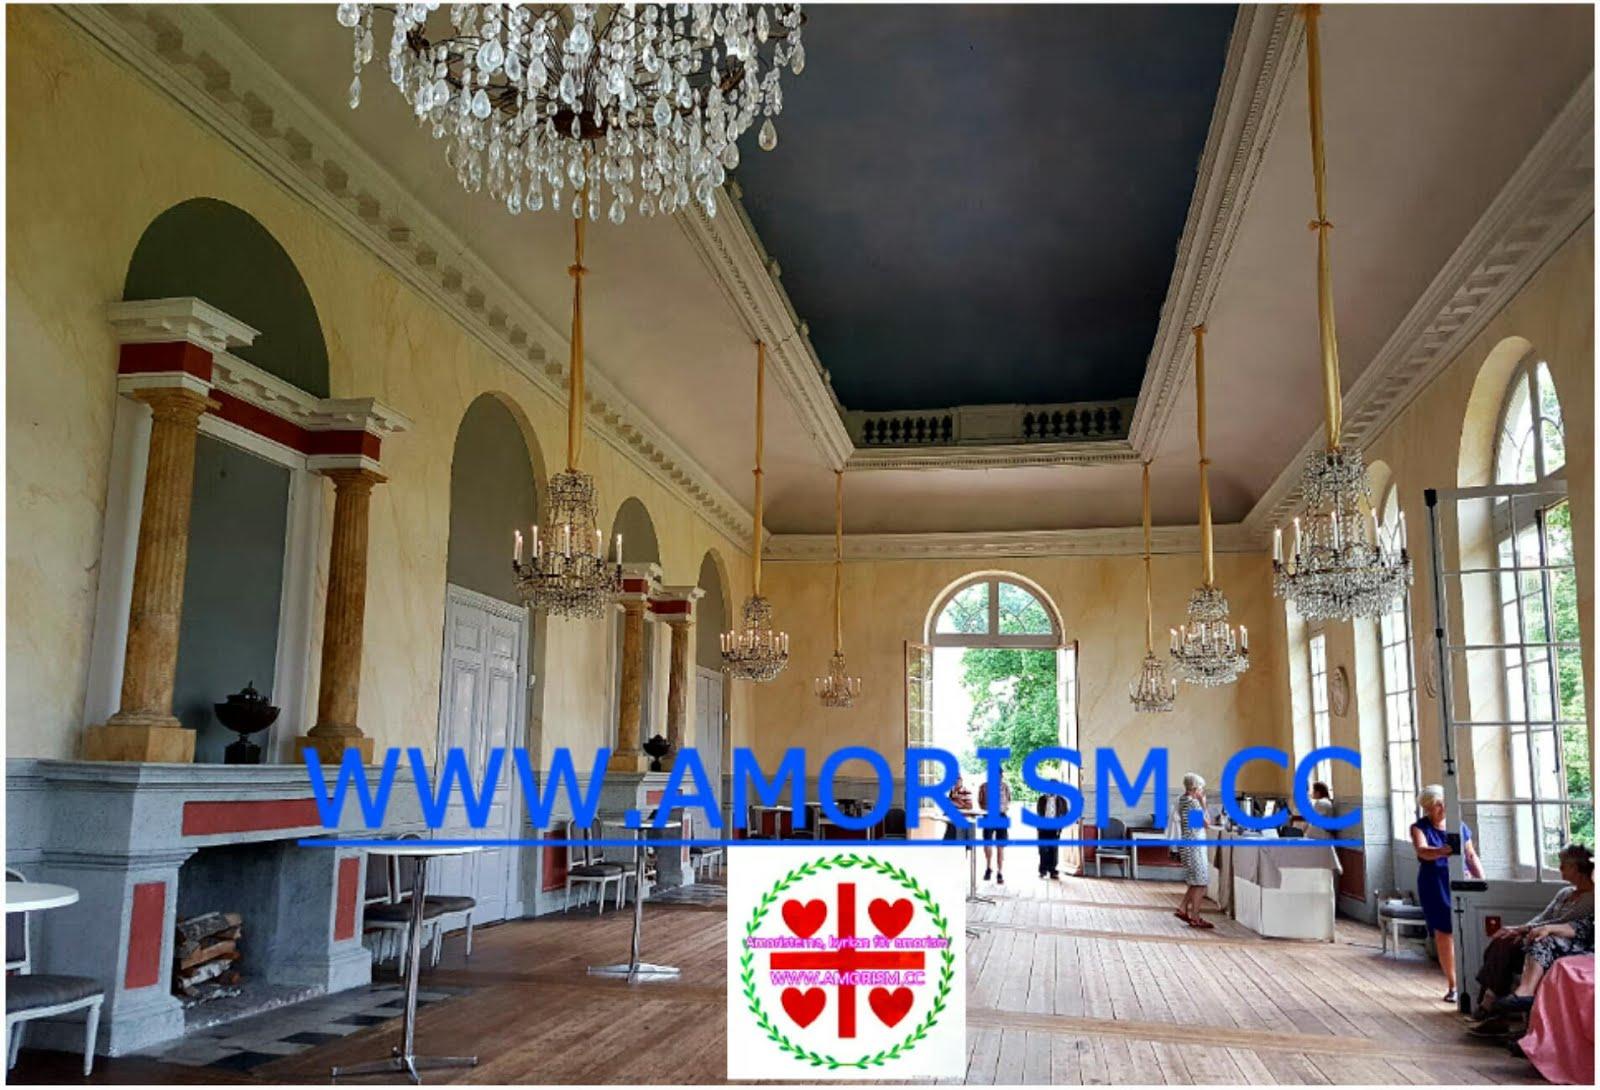 Image Drottningholms slottsteater 250 years jubilee